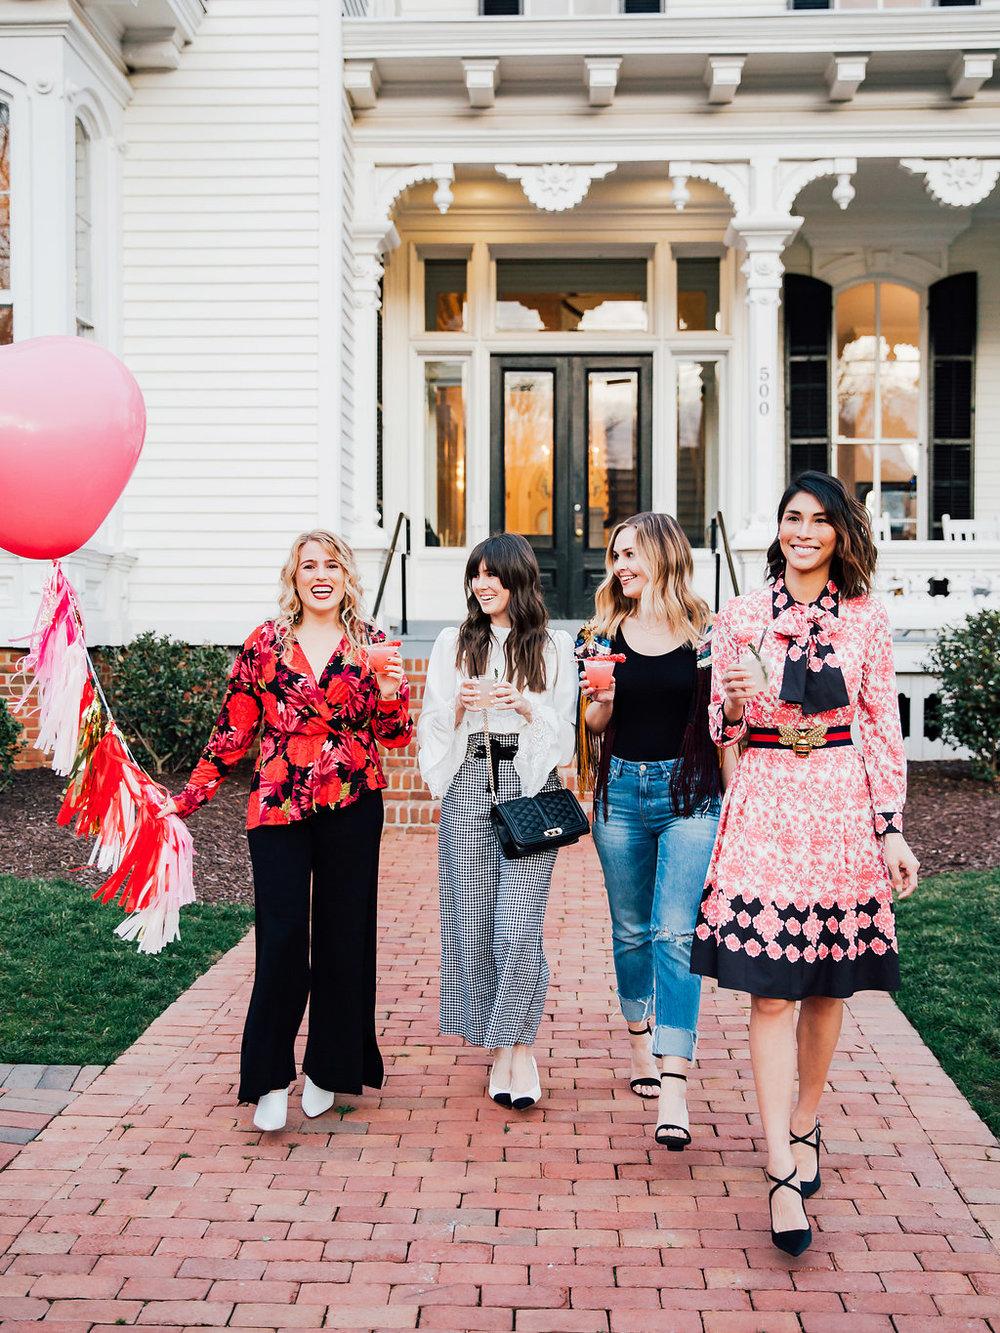 girlboss gathering '18 RALEIGH, NC